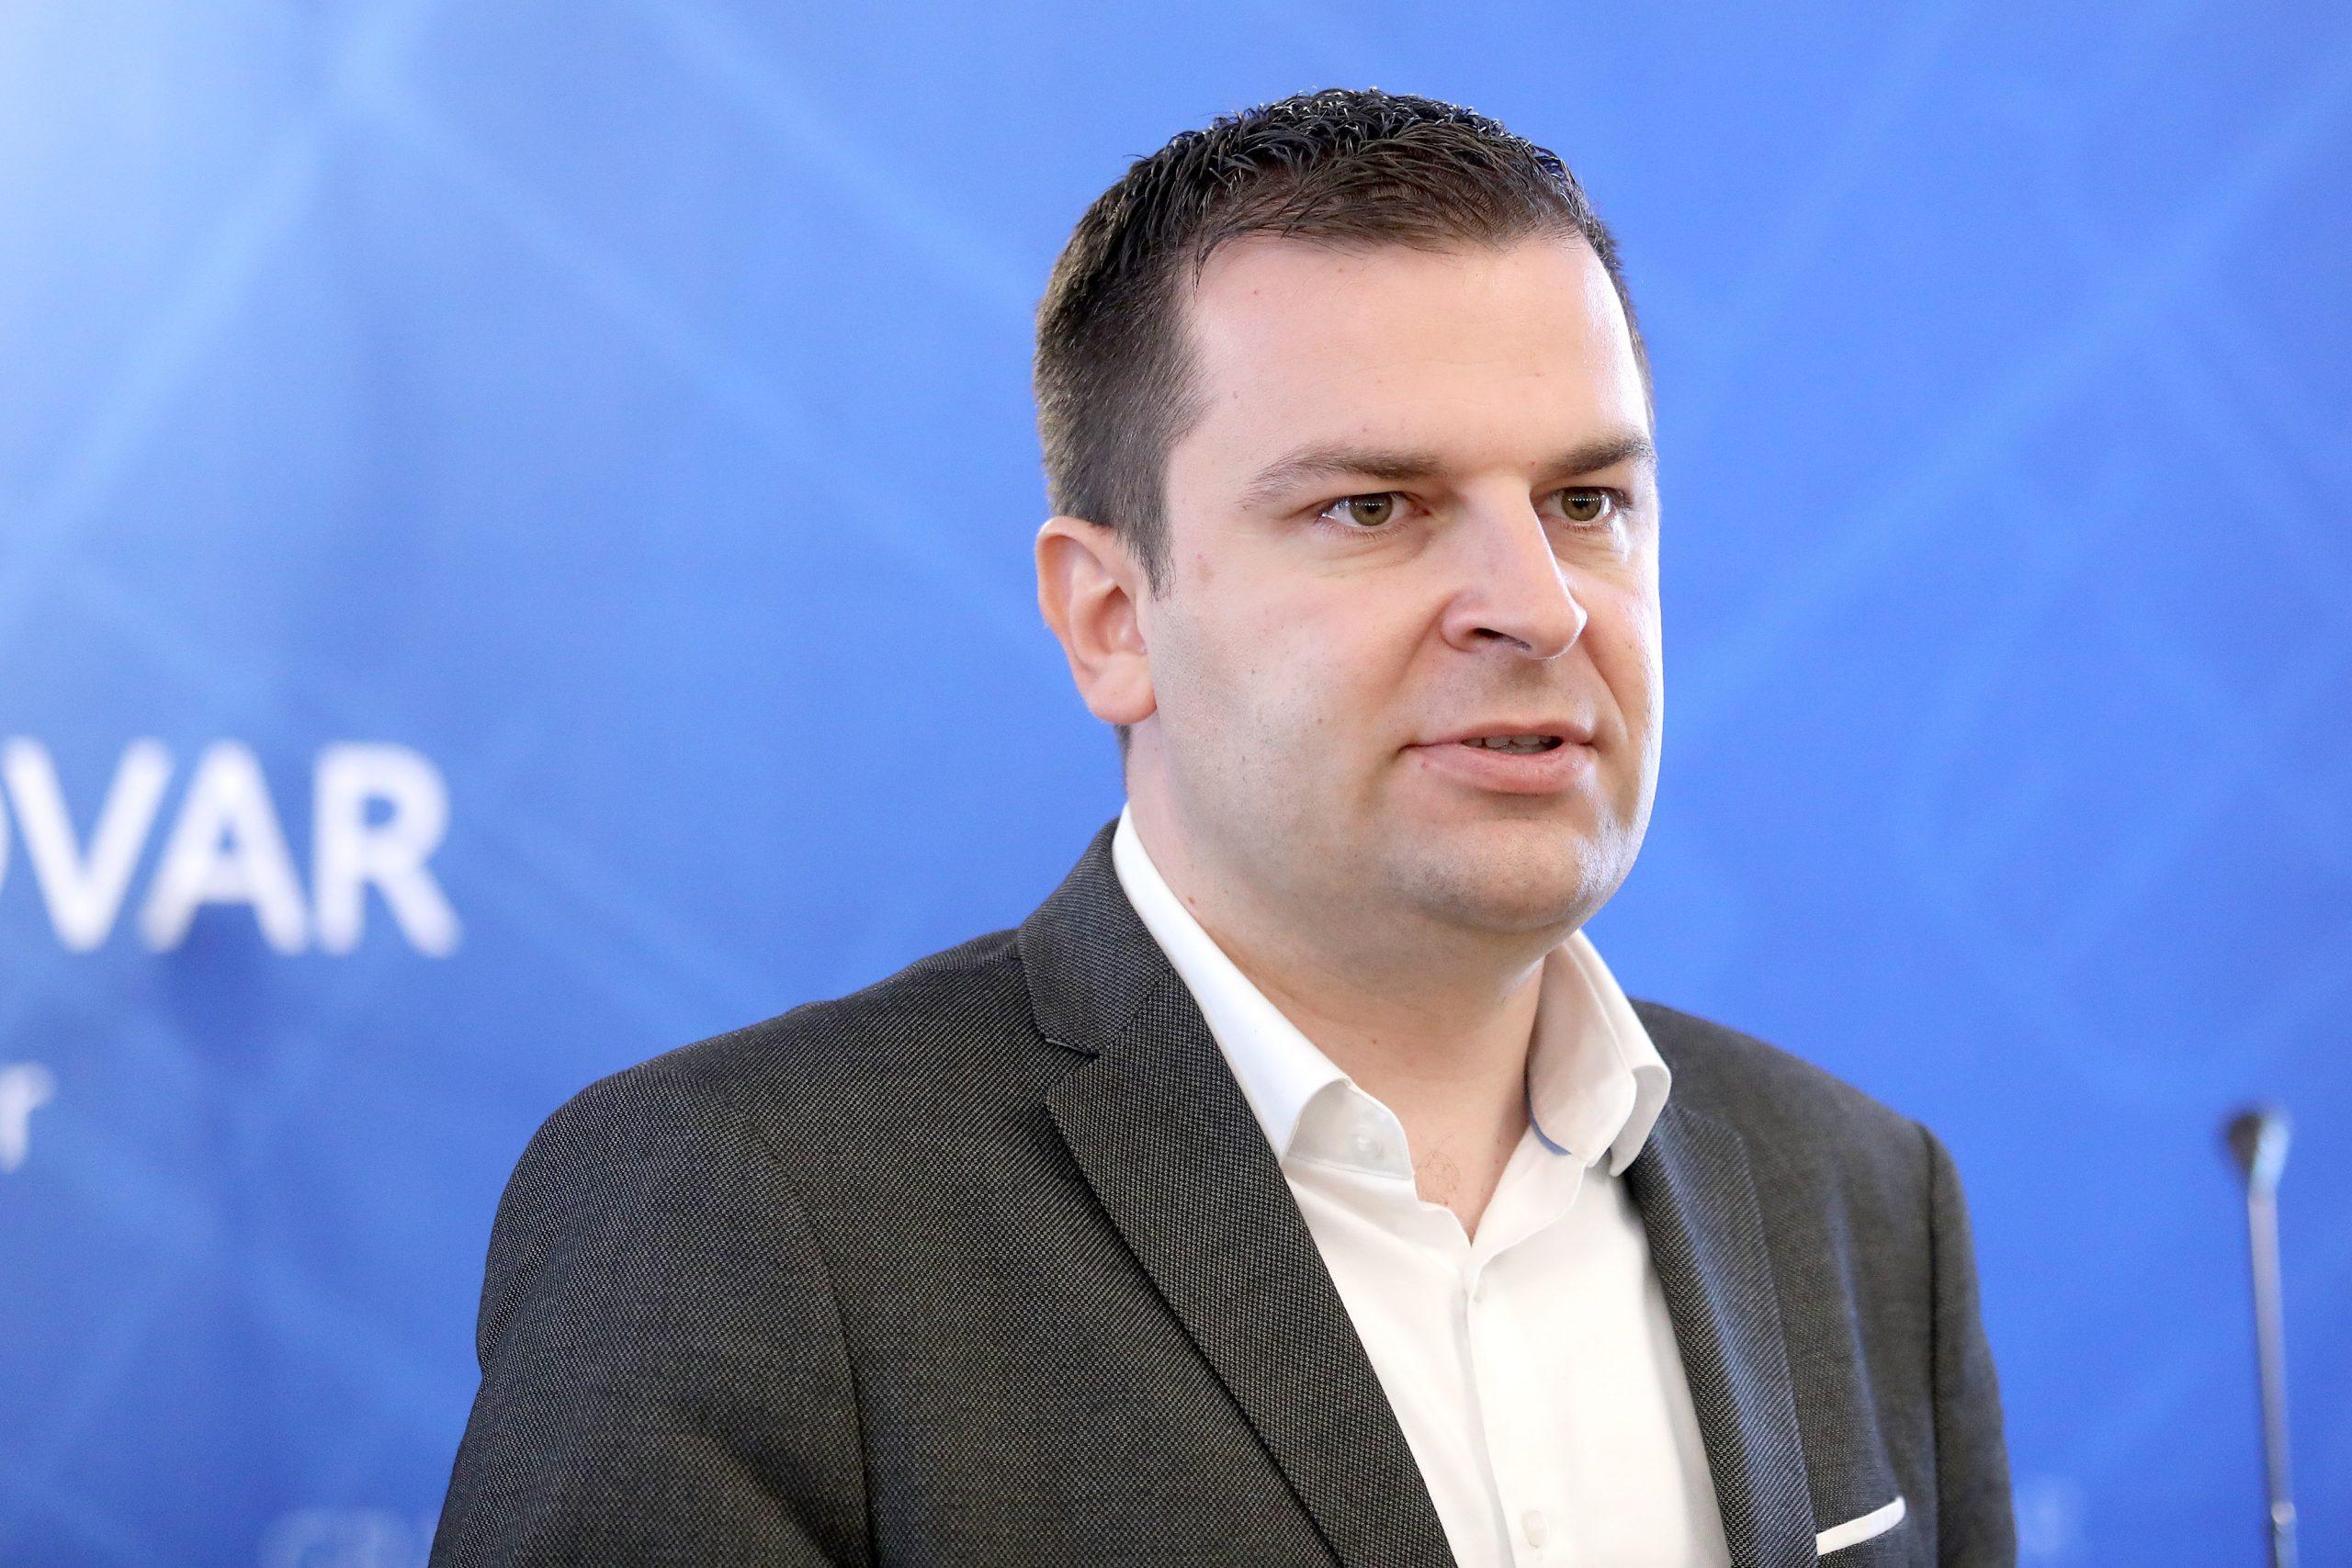 Dario Hrebak - praktični vjernik s liberalnim stavovima / Foto Patrik Macek/PIXSELL